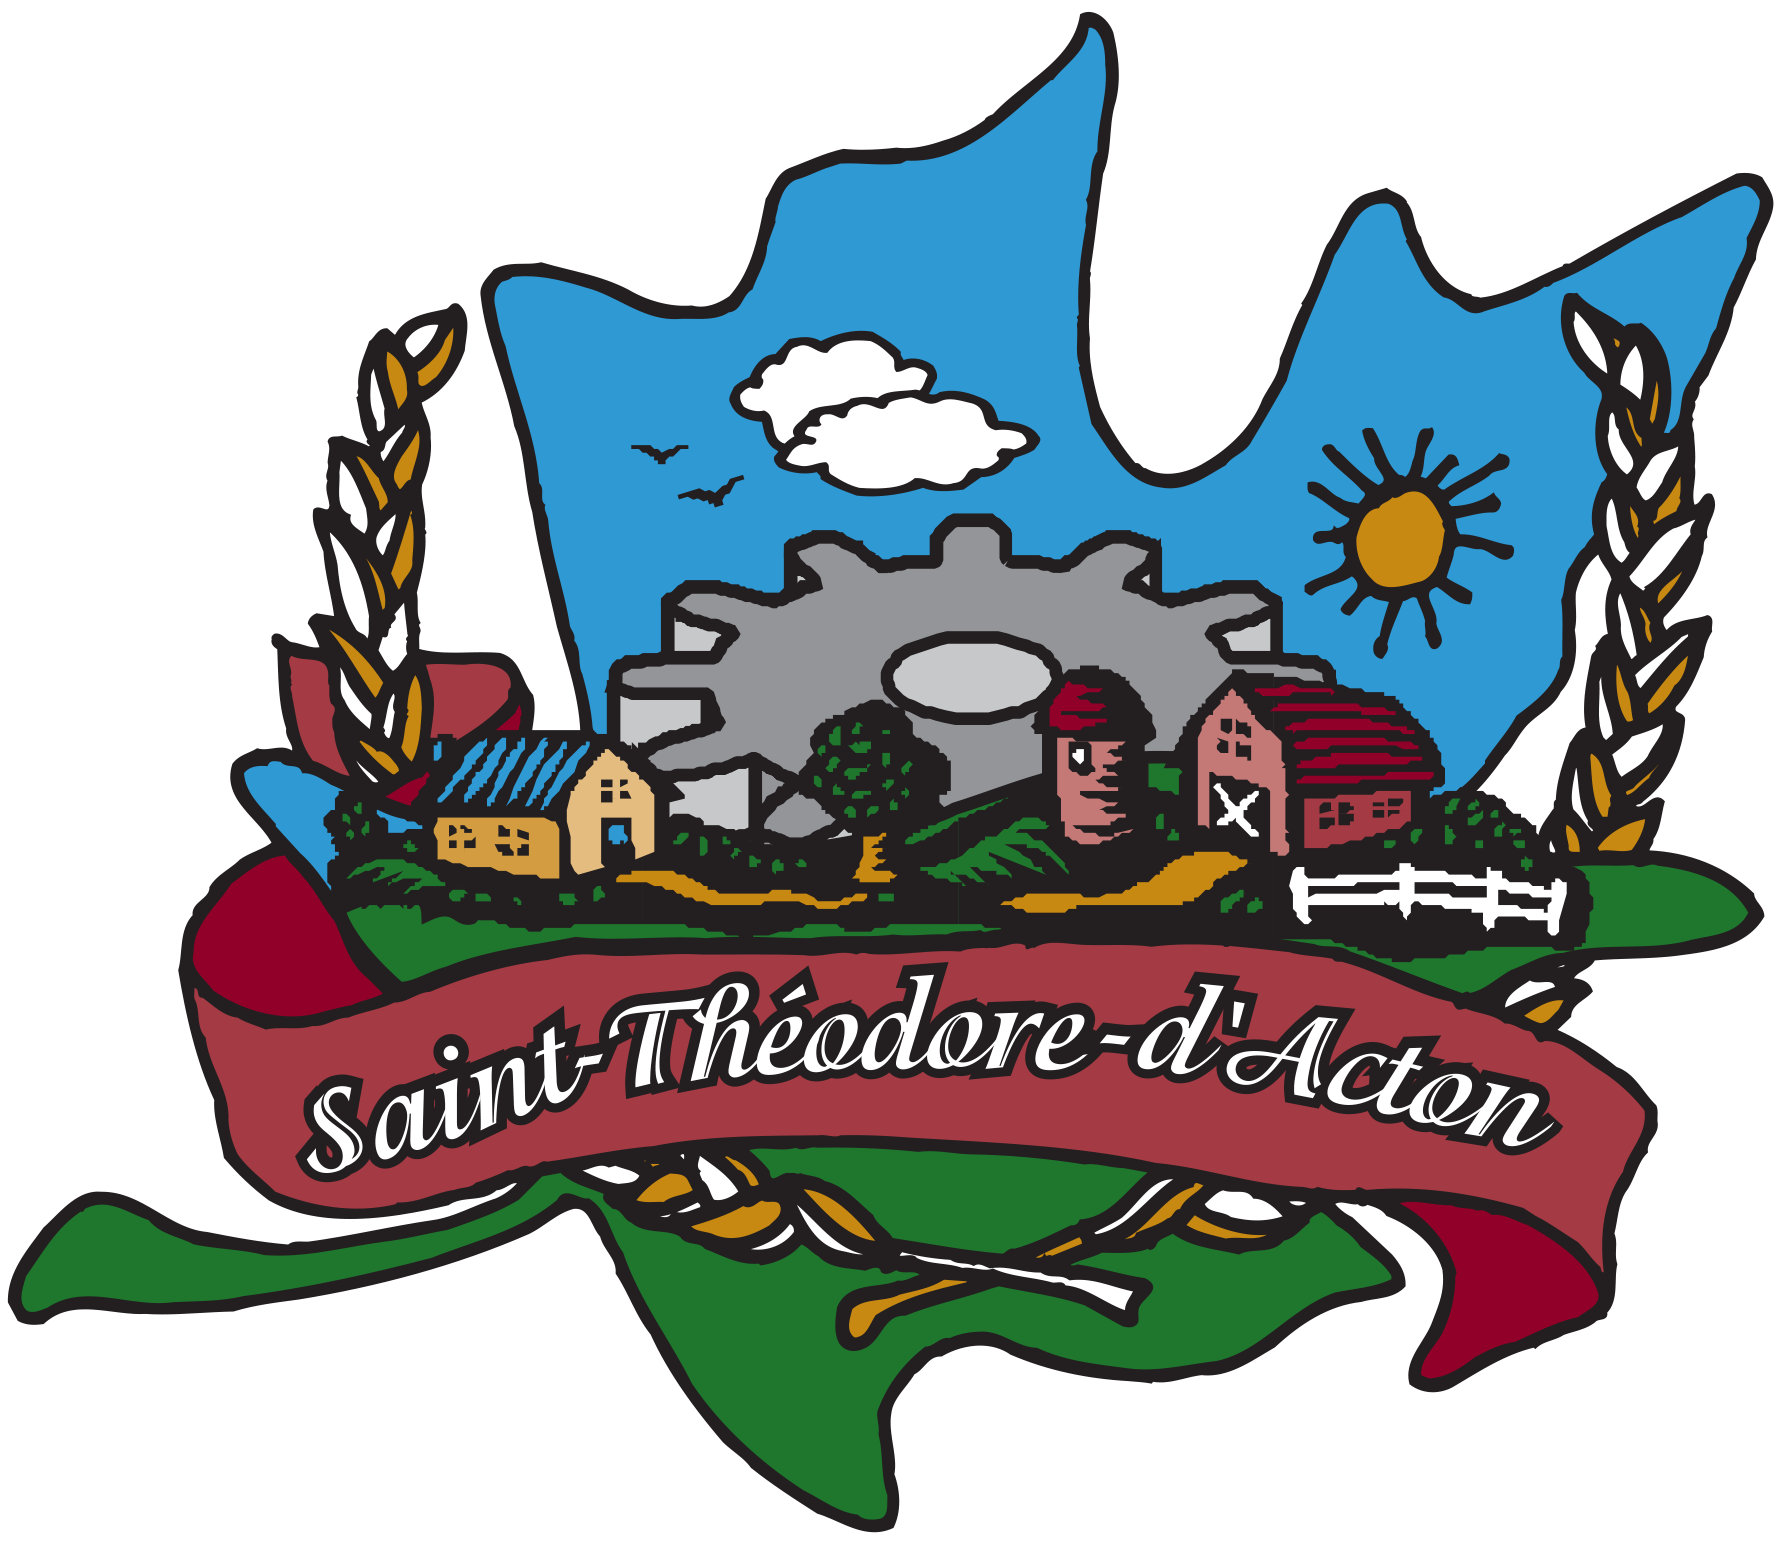 Saint-Théodore-d'Acton - logo